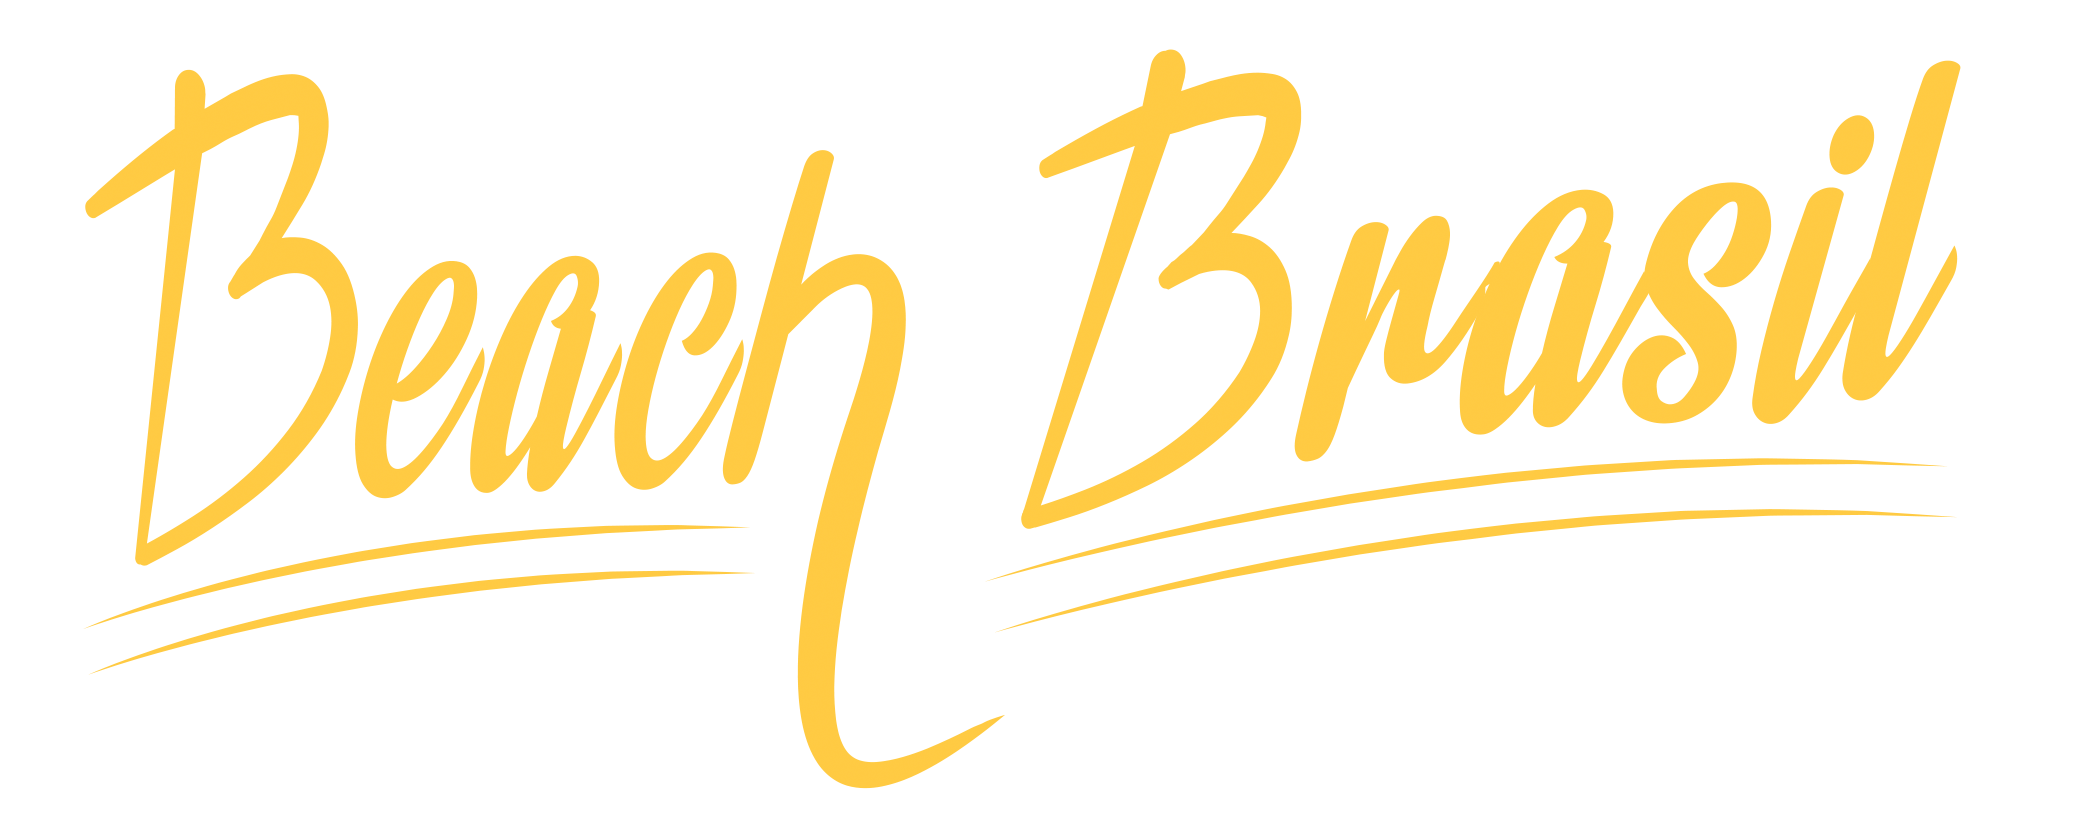 Beachbrasil Bikini e Beachwear